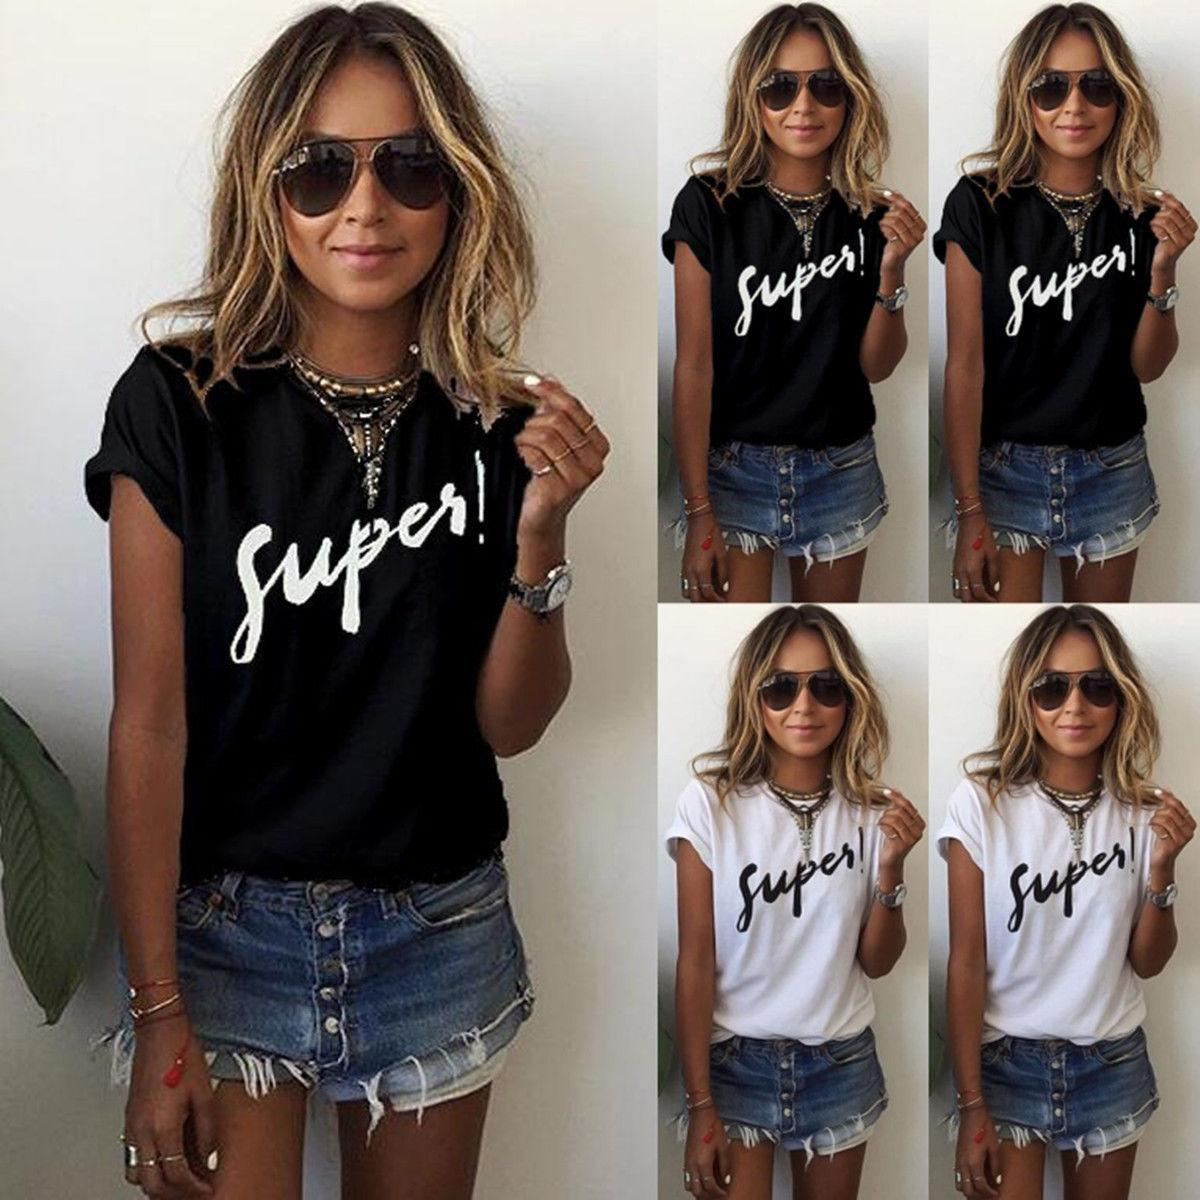 8786b73e95e9c Satın Al Bayan Mektup Bluz T Shirt Kısa Kollu Rahat Gevşek Yaz Yuvarlak  Boyun Tee Gömlek Tops Artı Boyutu S 5XL, $6.03 | DHgate.Com'da